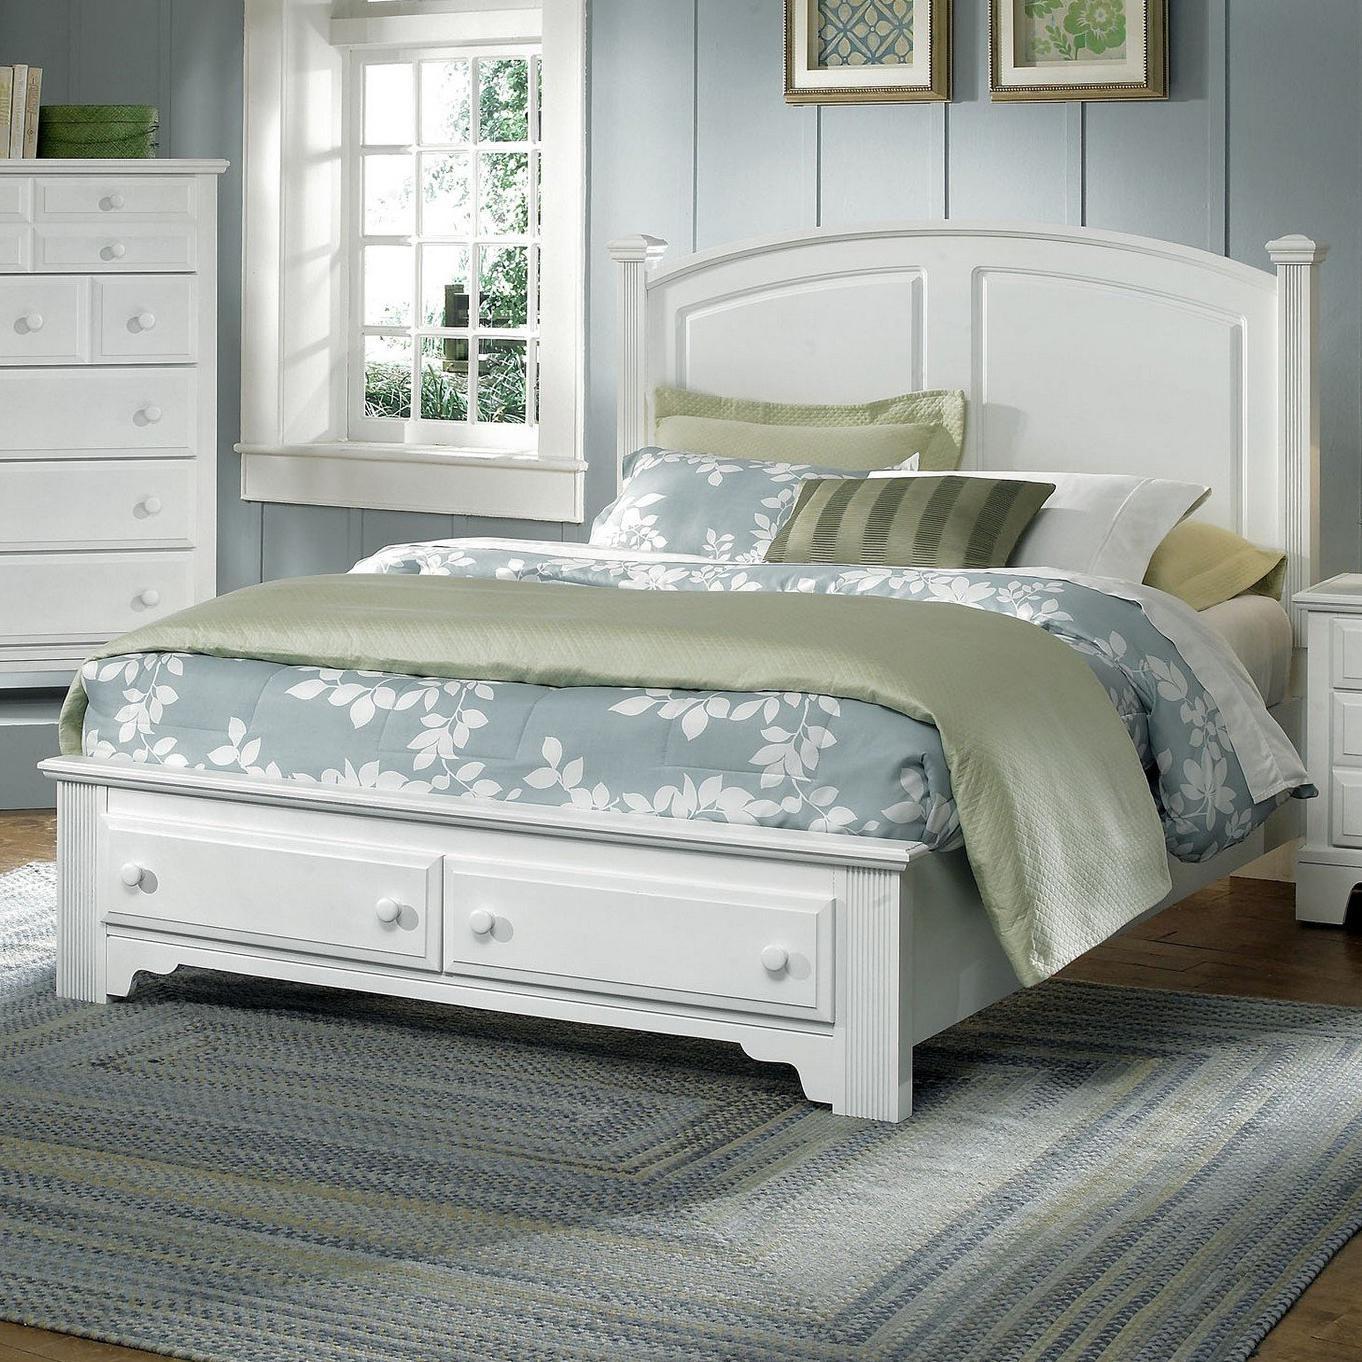 Hamilton/Franklin Full Panel Storage Bed by Vaughan Bassett at Johnny Janosik